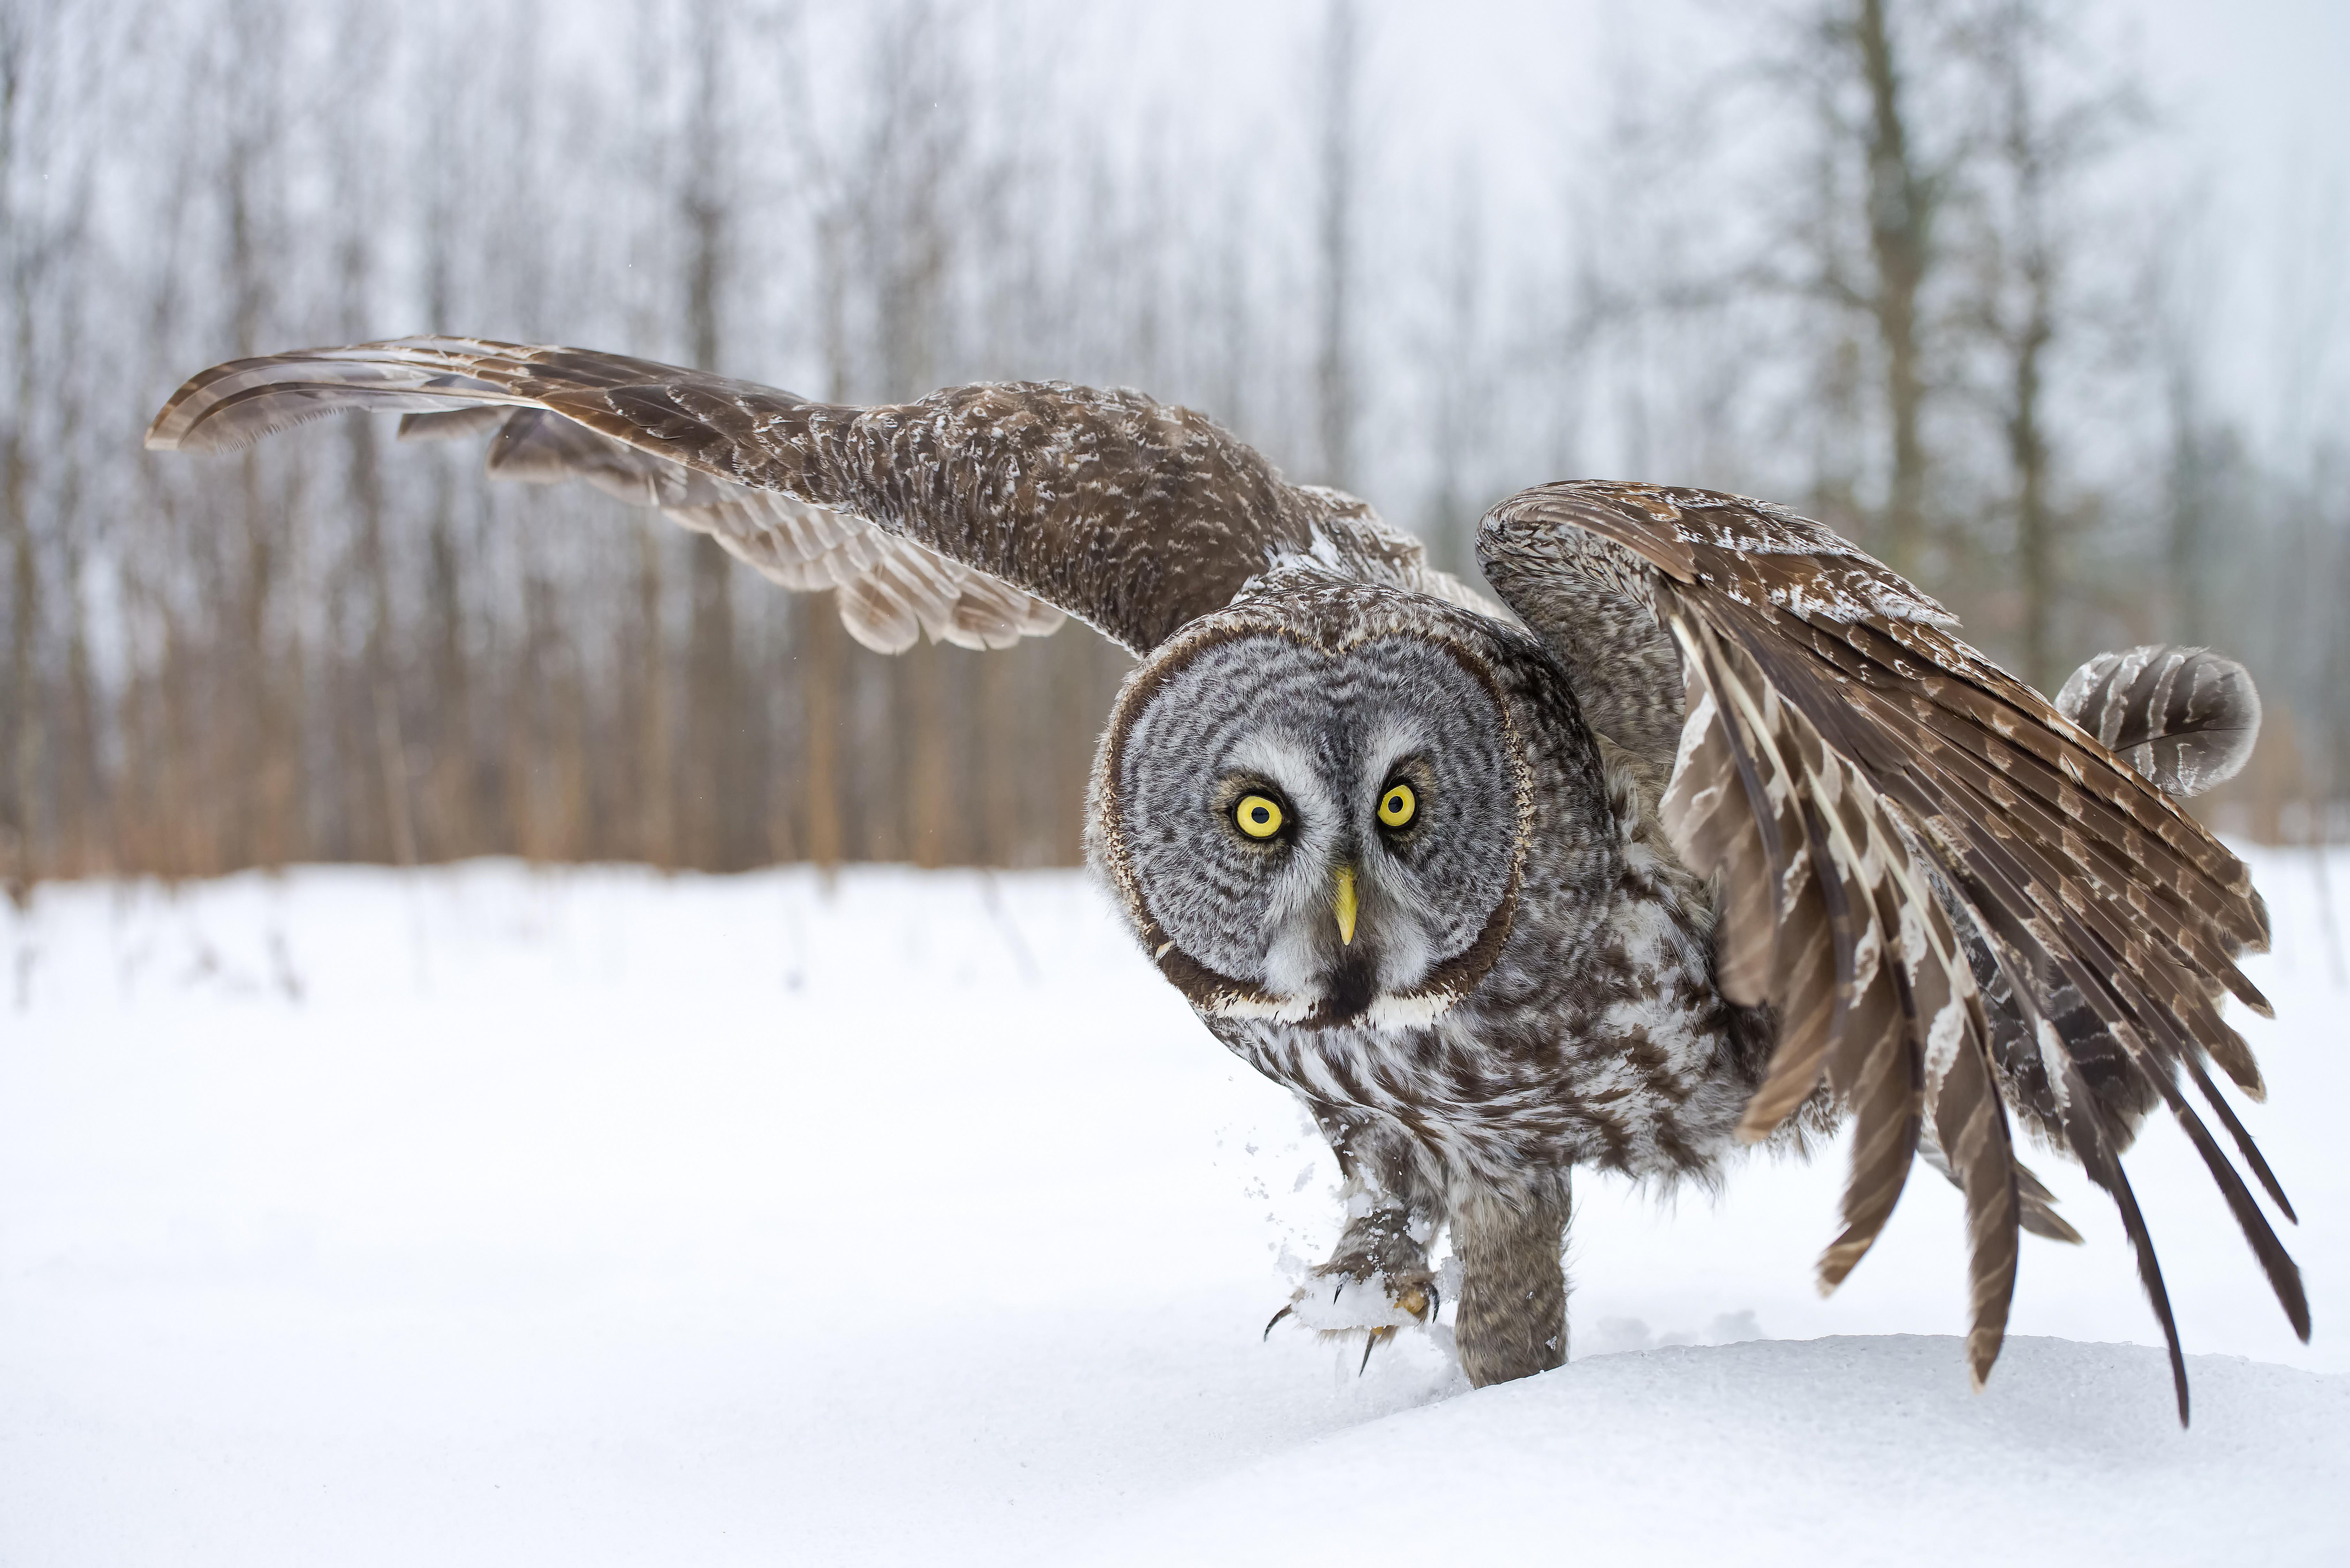 Owl Vocabulary to Understand Their World